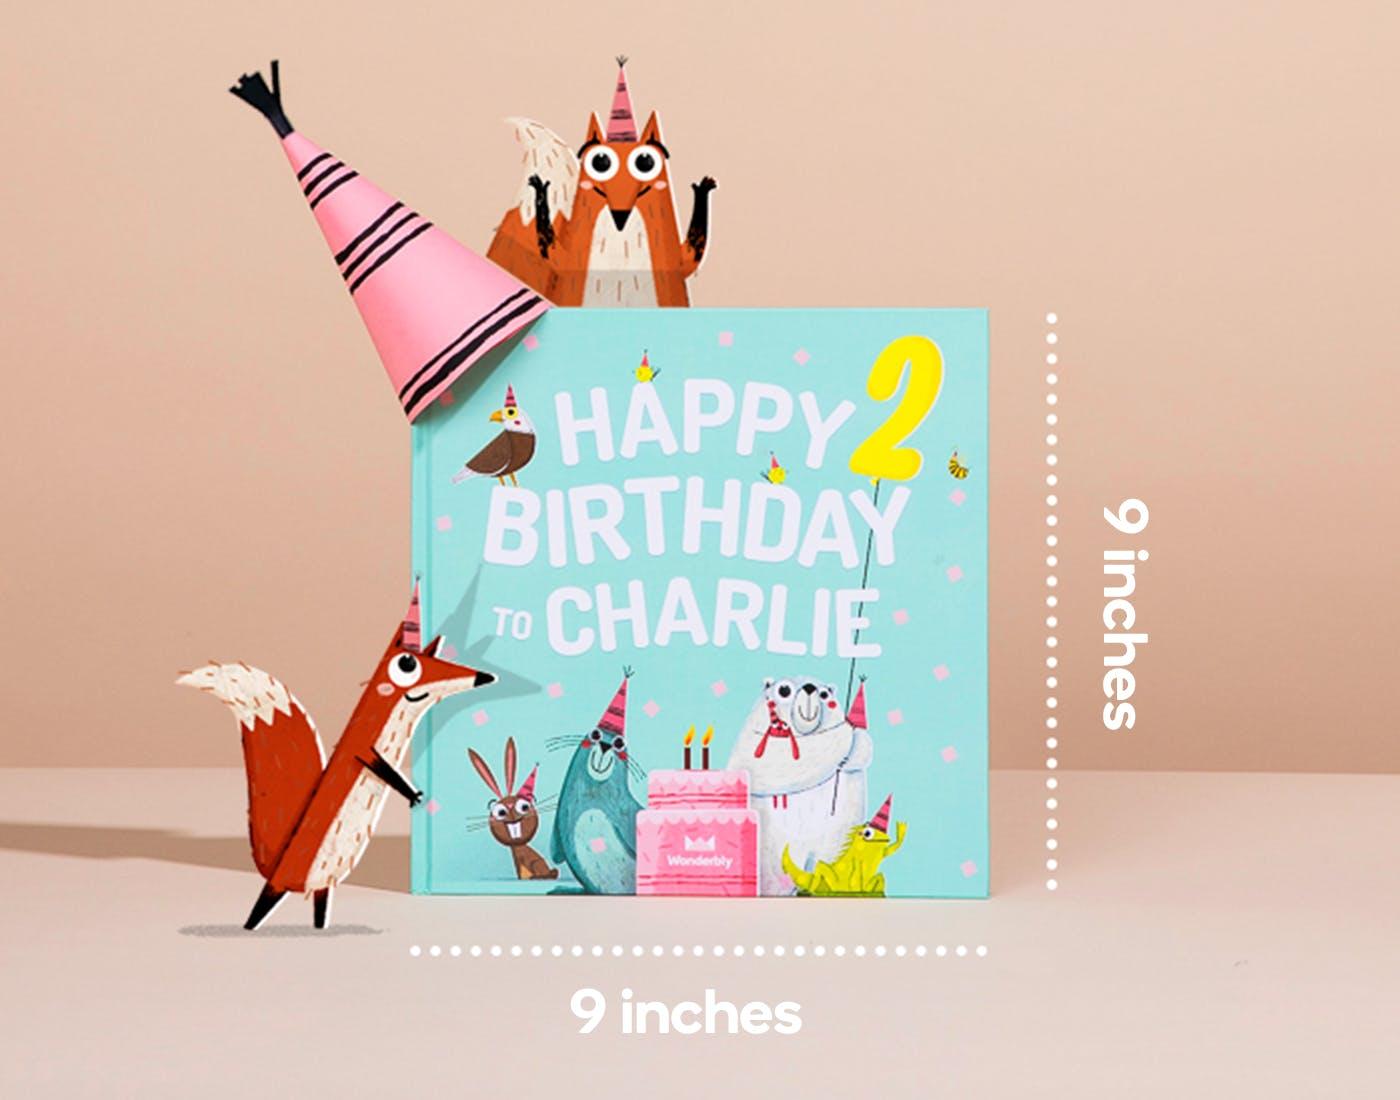 Happy birthday - Mint Green dimensions US